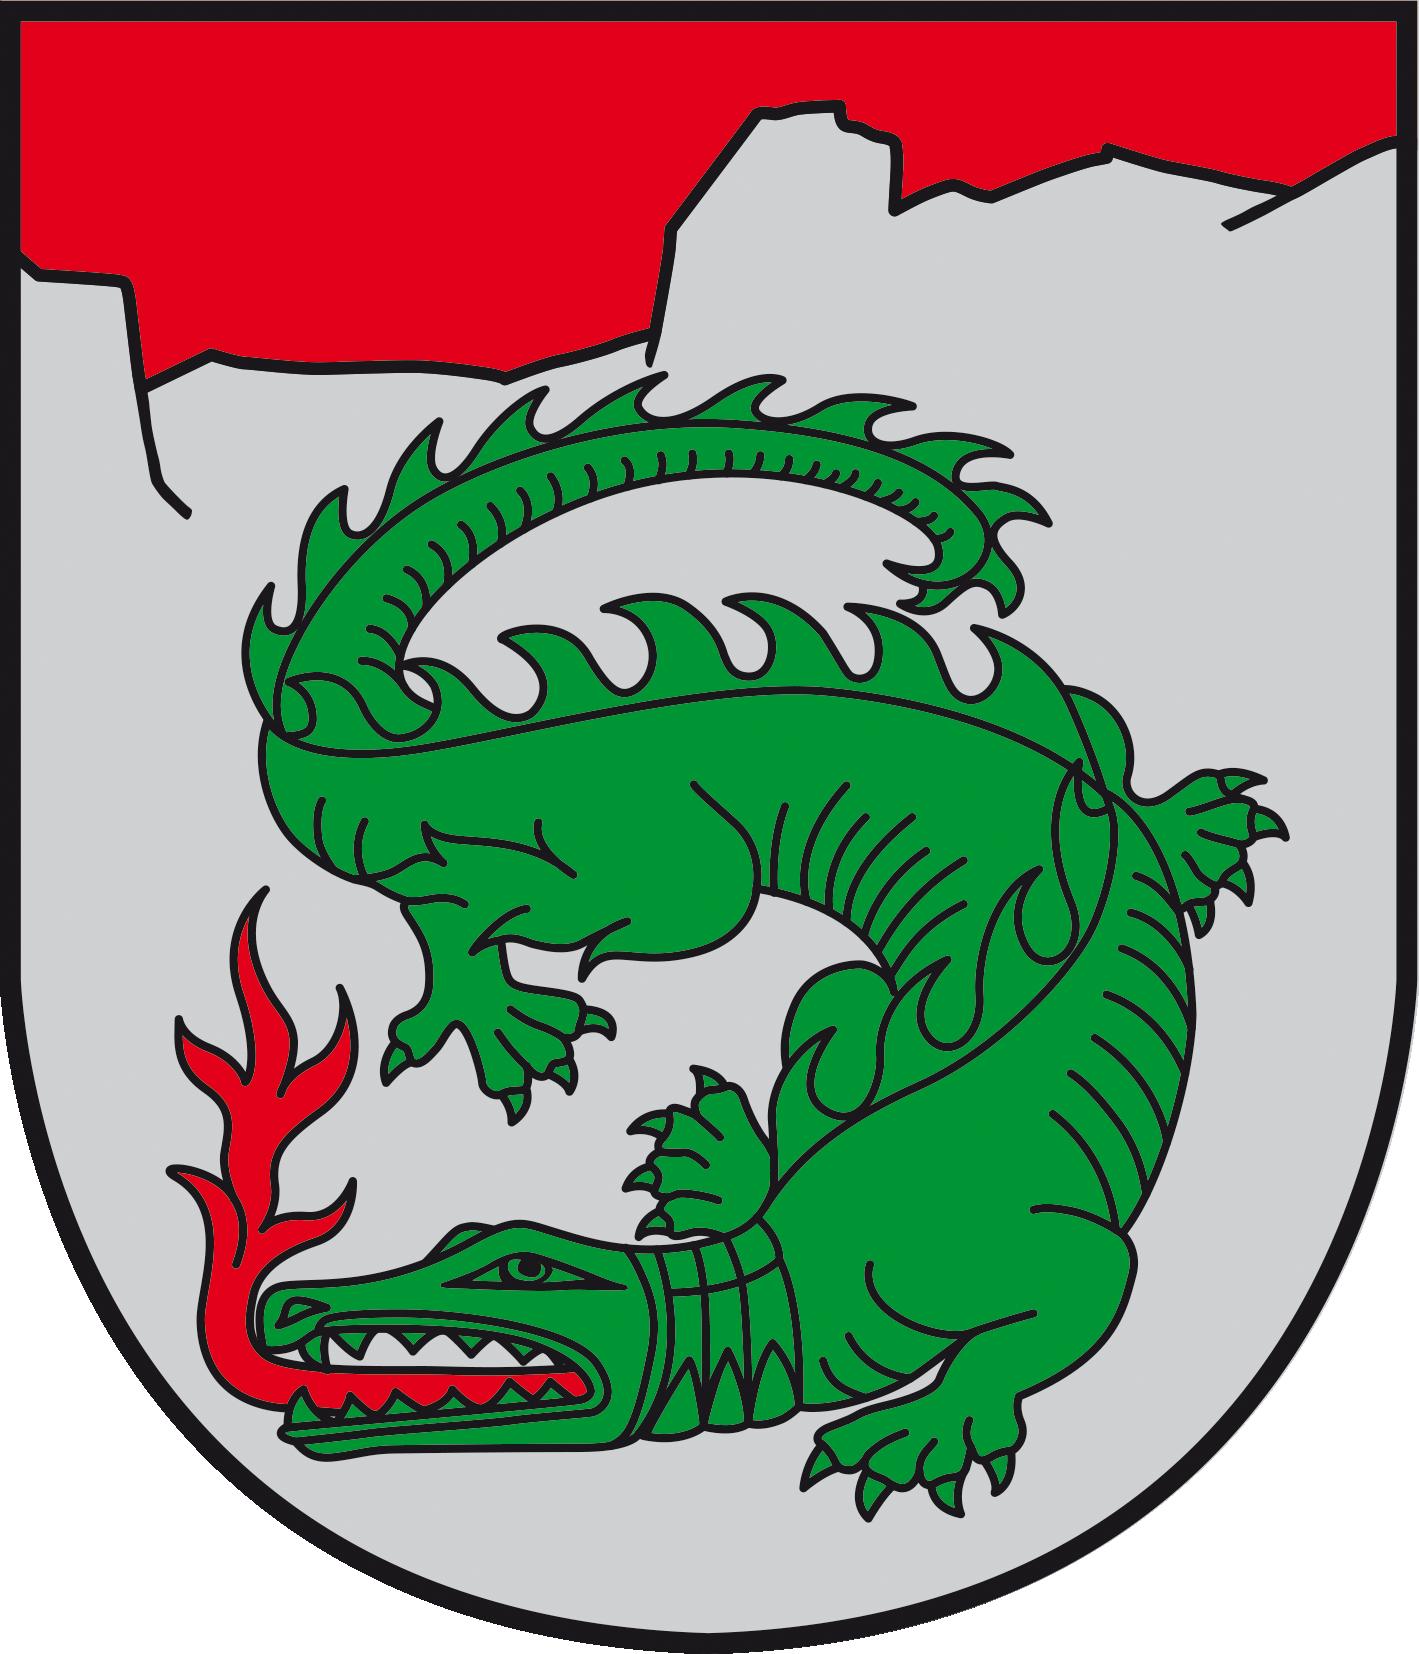 Ergebnisse 2019 - Bezirkslaufcup Liezen